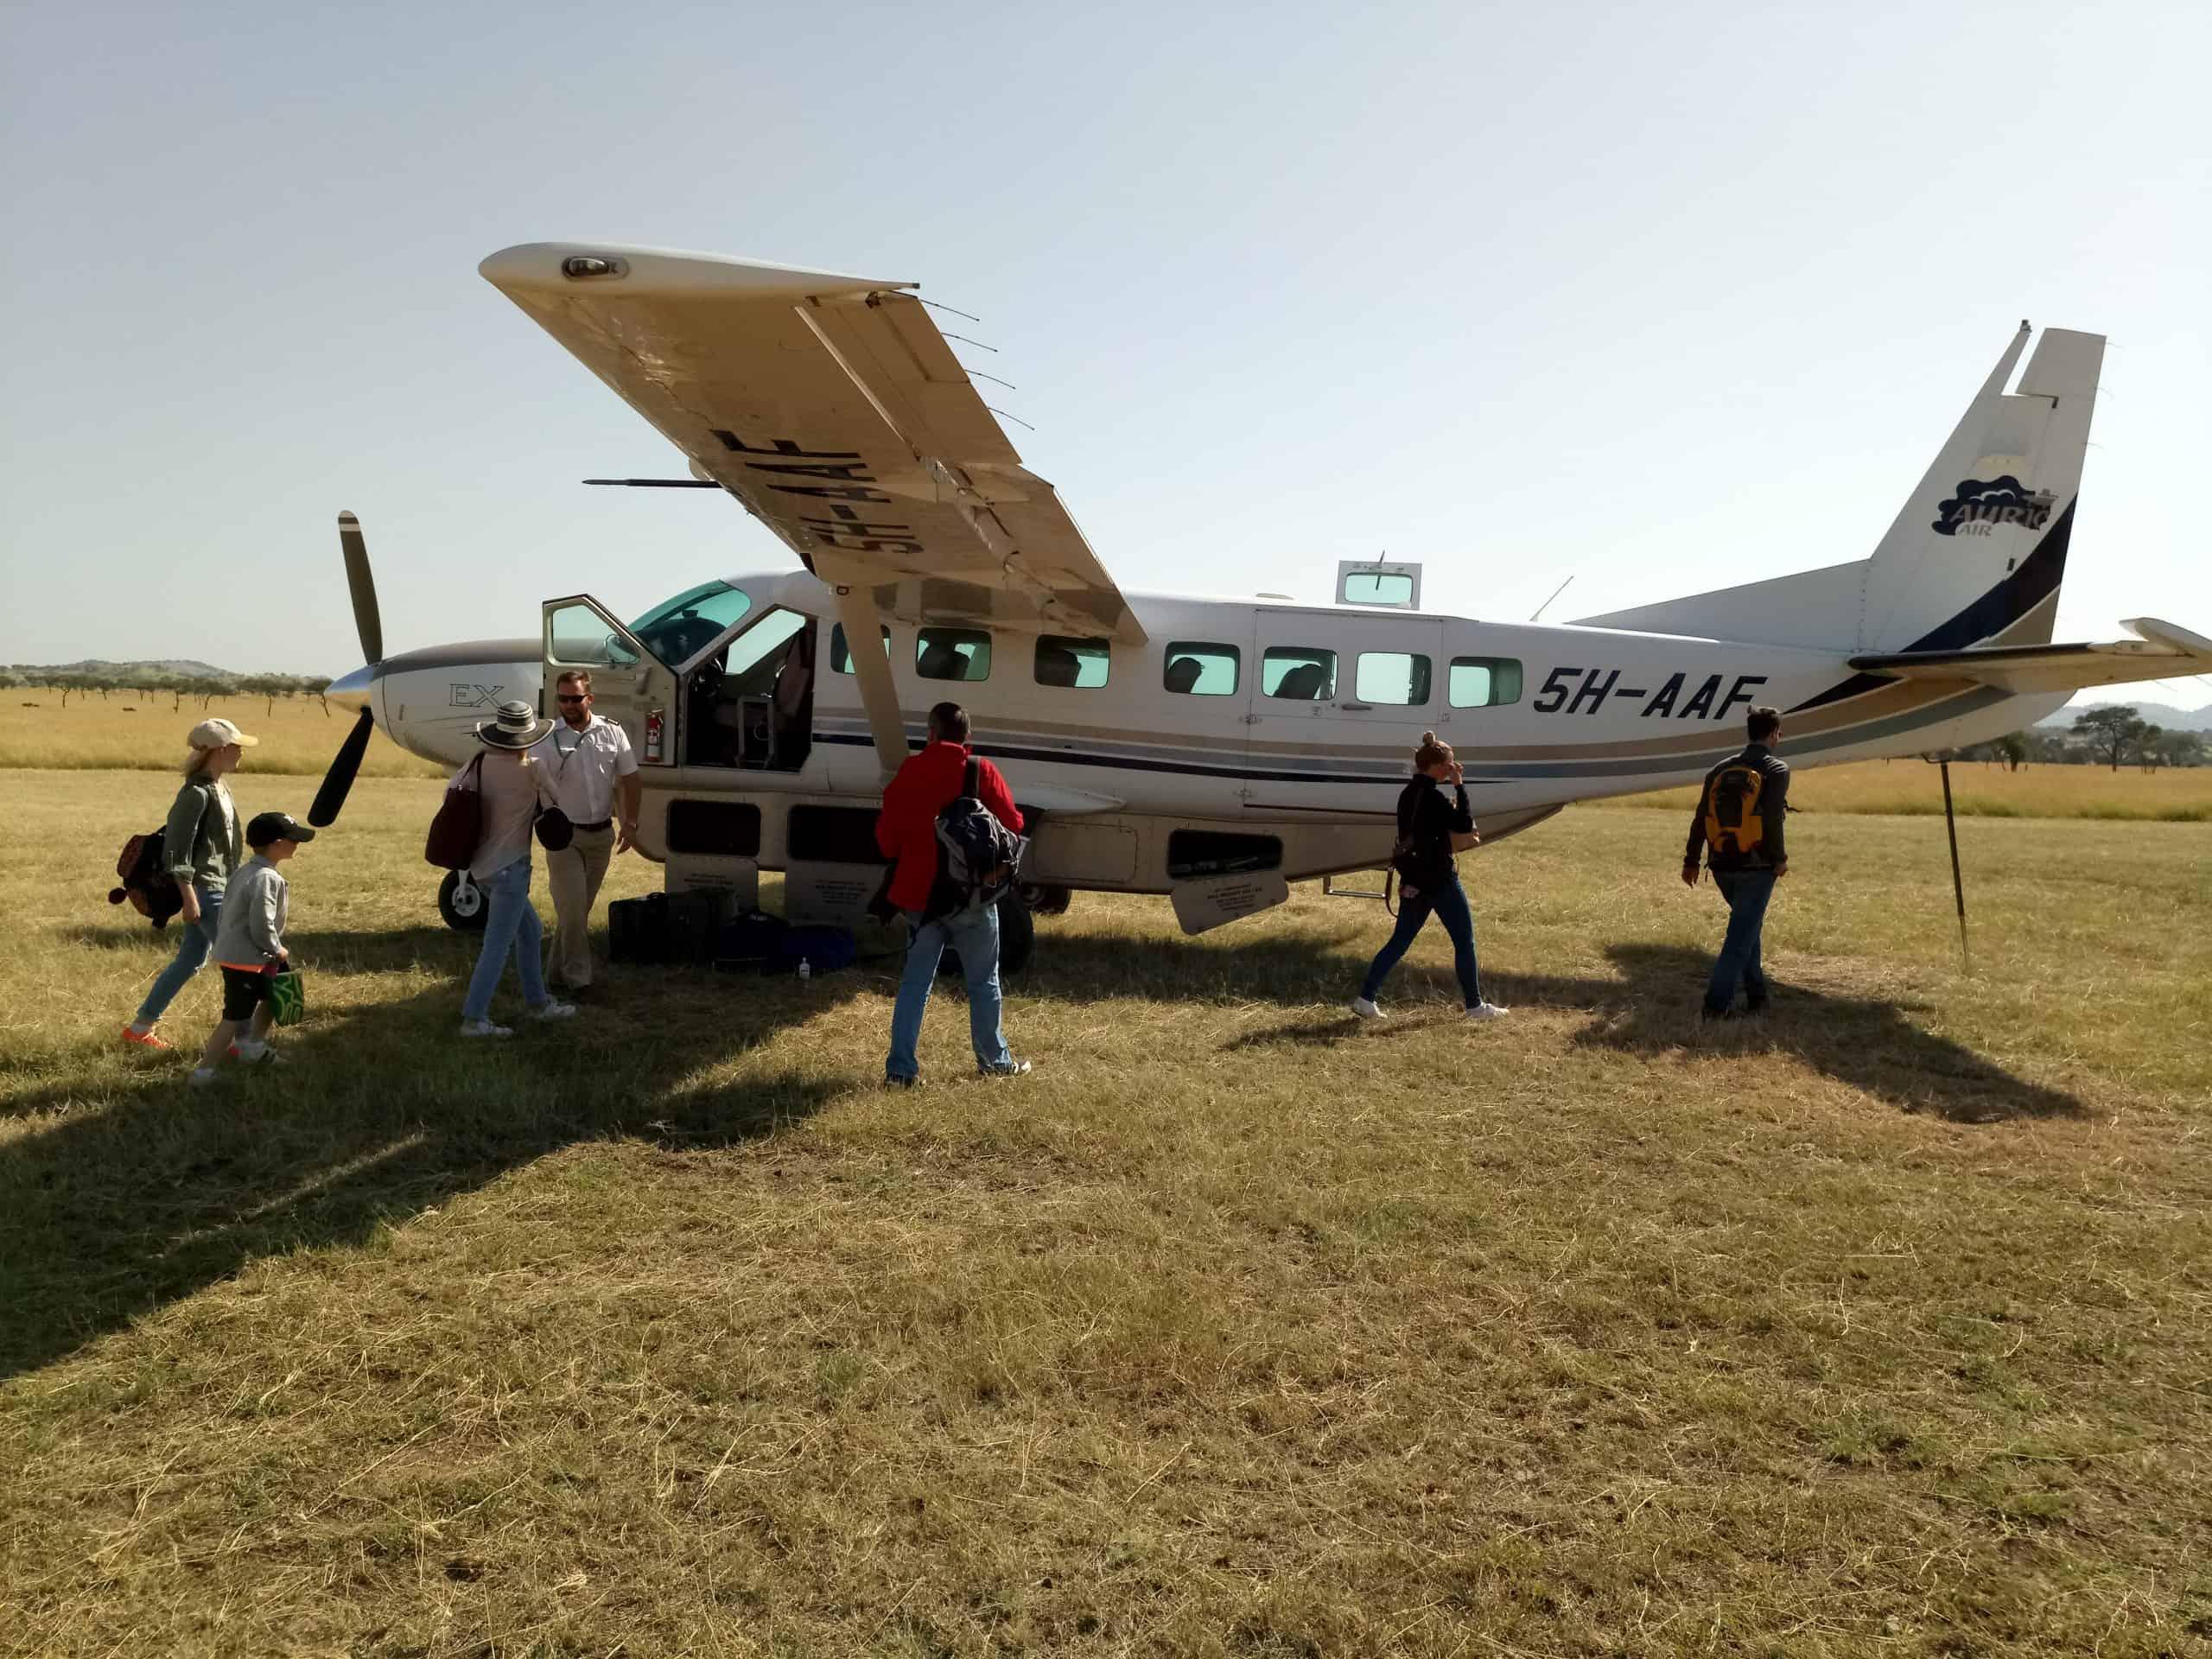 Flying Back After Serengeti Safaris